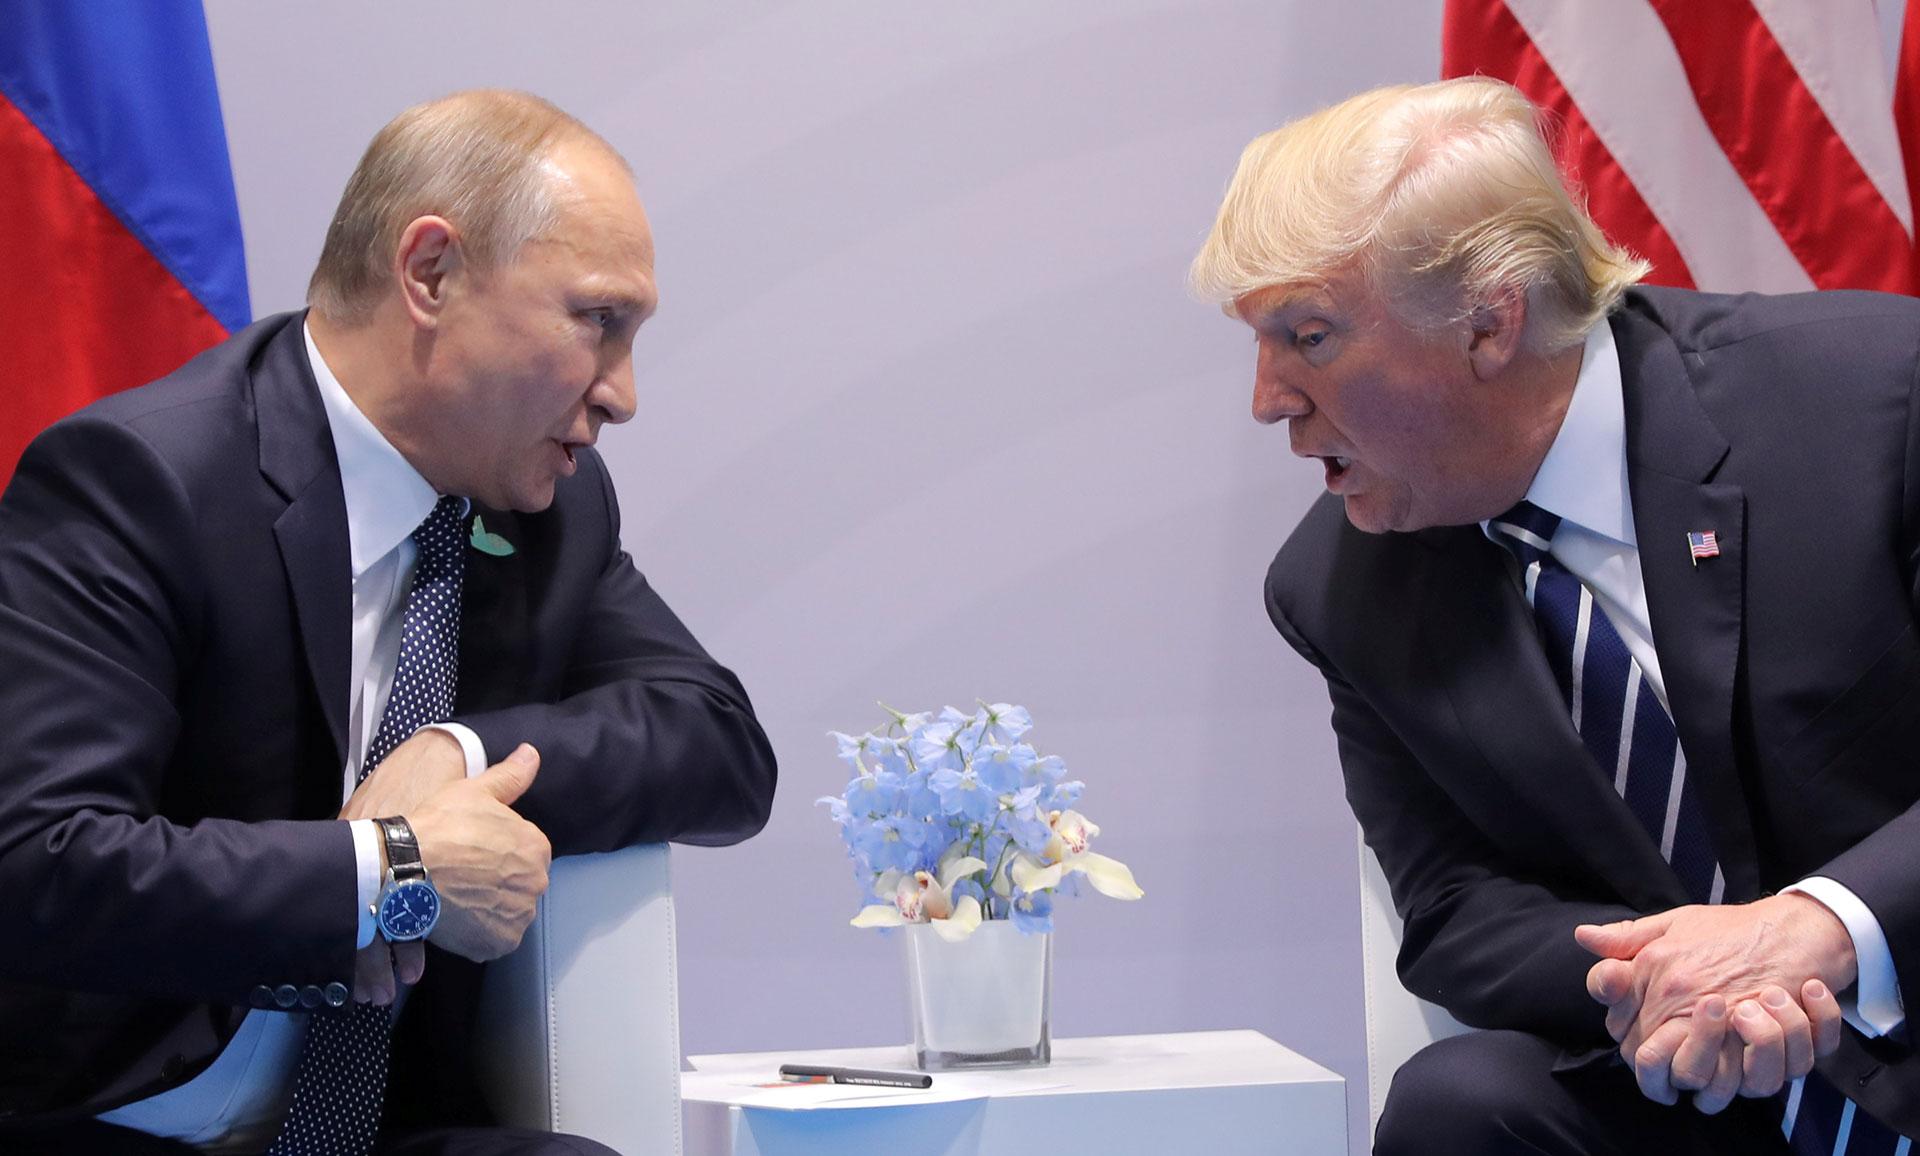 Donald Trump y Vladimir Putin. (REUTERS/Carlos Barria)